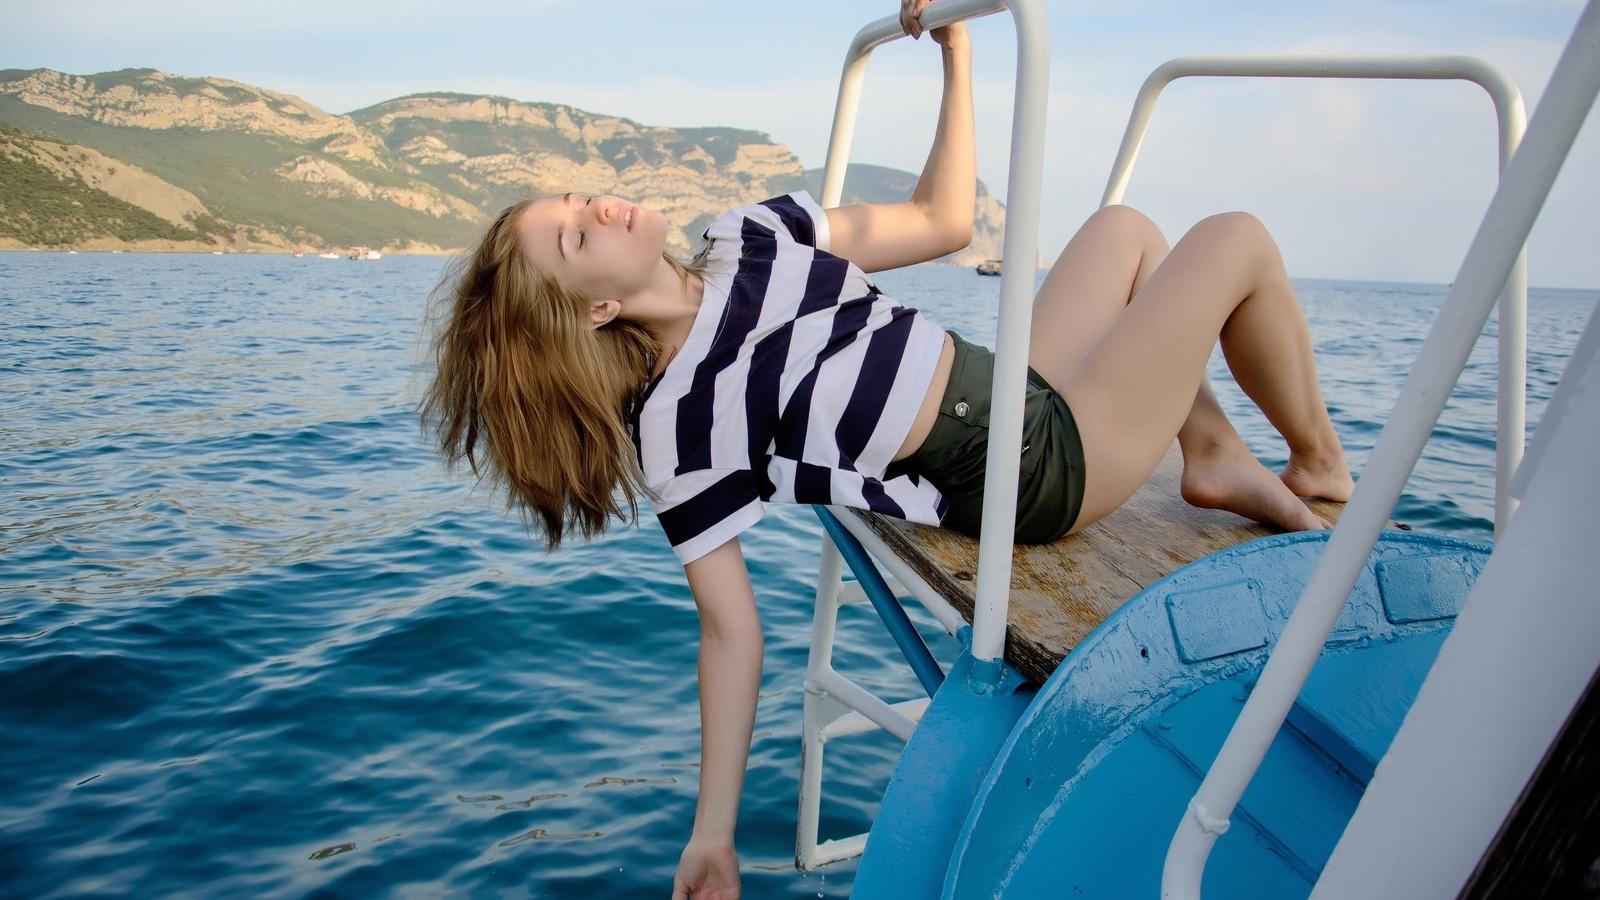 dmitry plotnikoff, carolina kris, boat, model, women, blonde, shorts, sea, barefoot, island, women outdoors, closed eyes, t-shirt